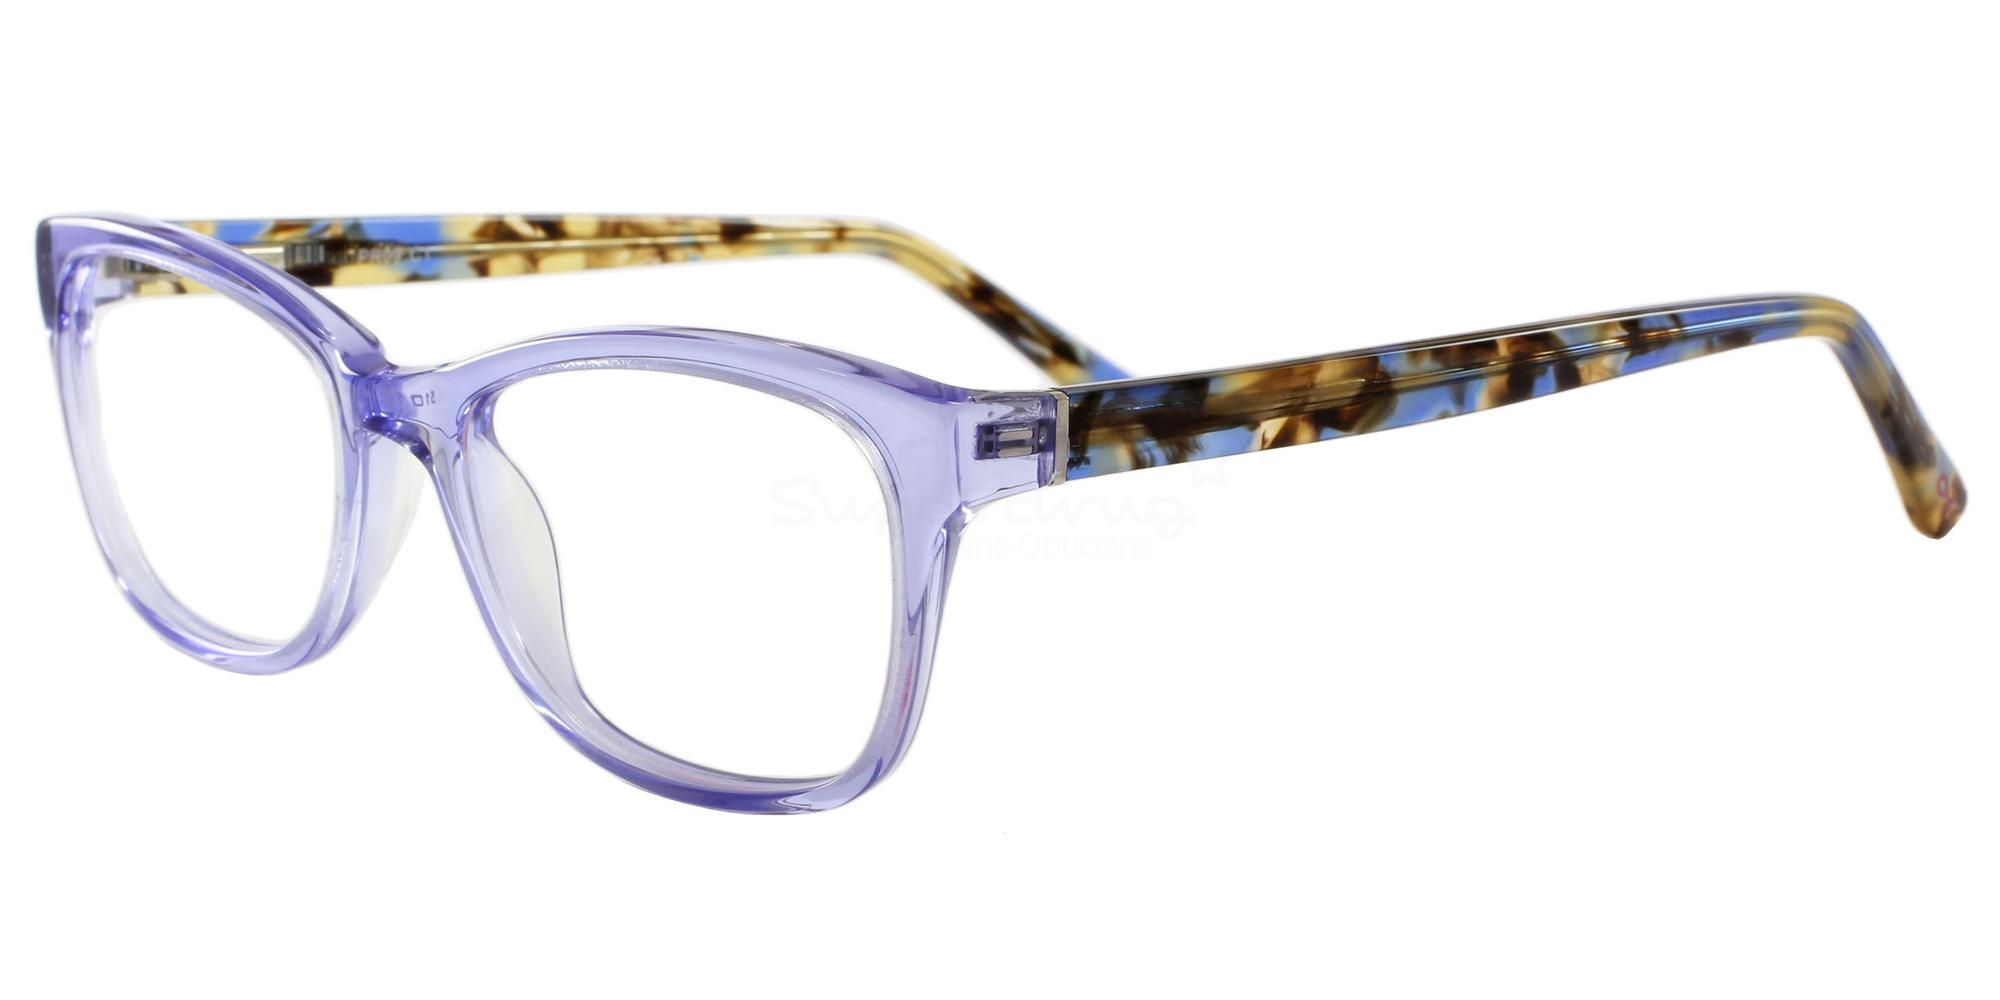 C1 09 Glasses, Pink Ribbon